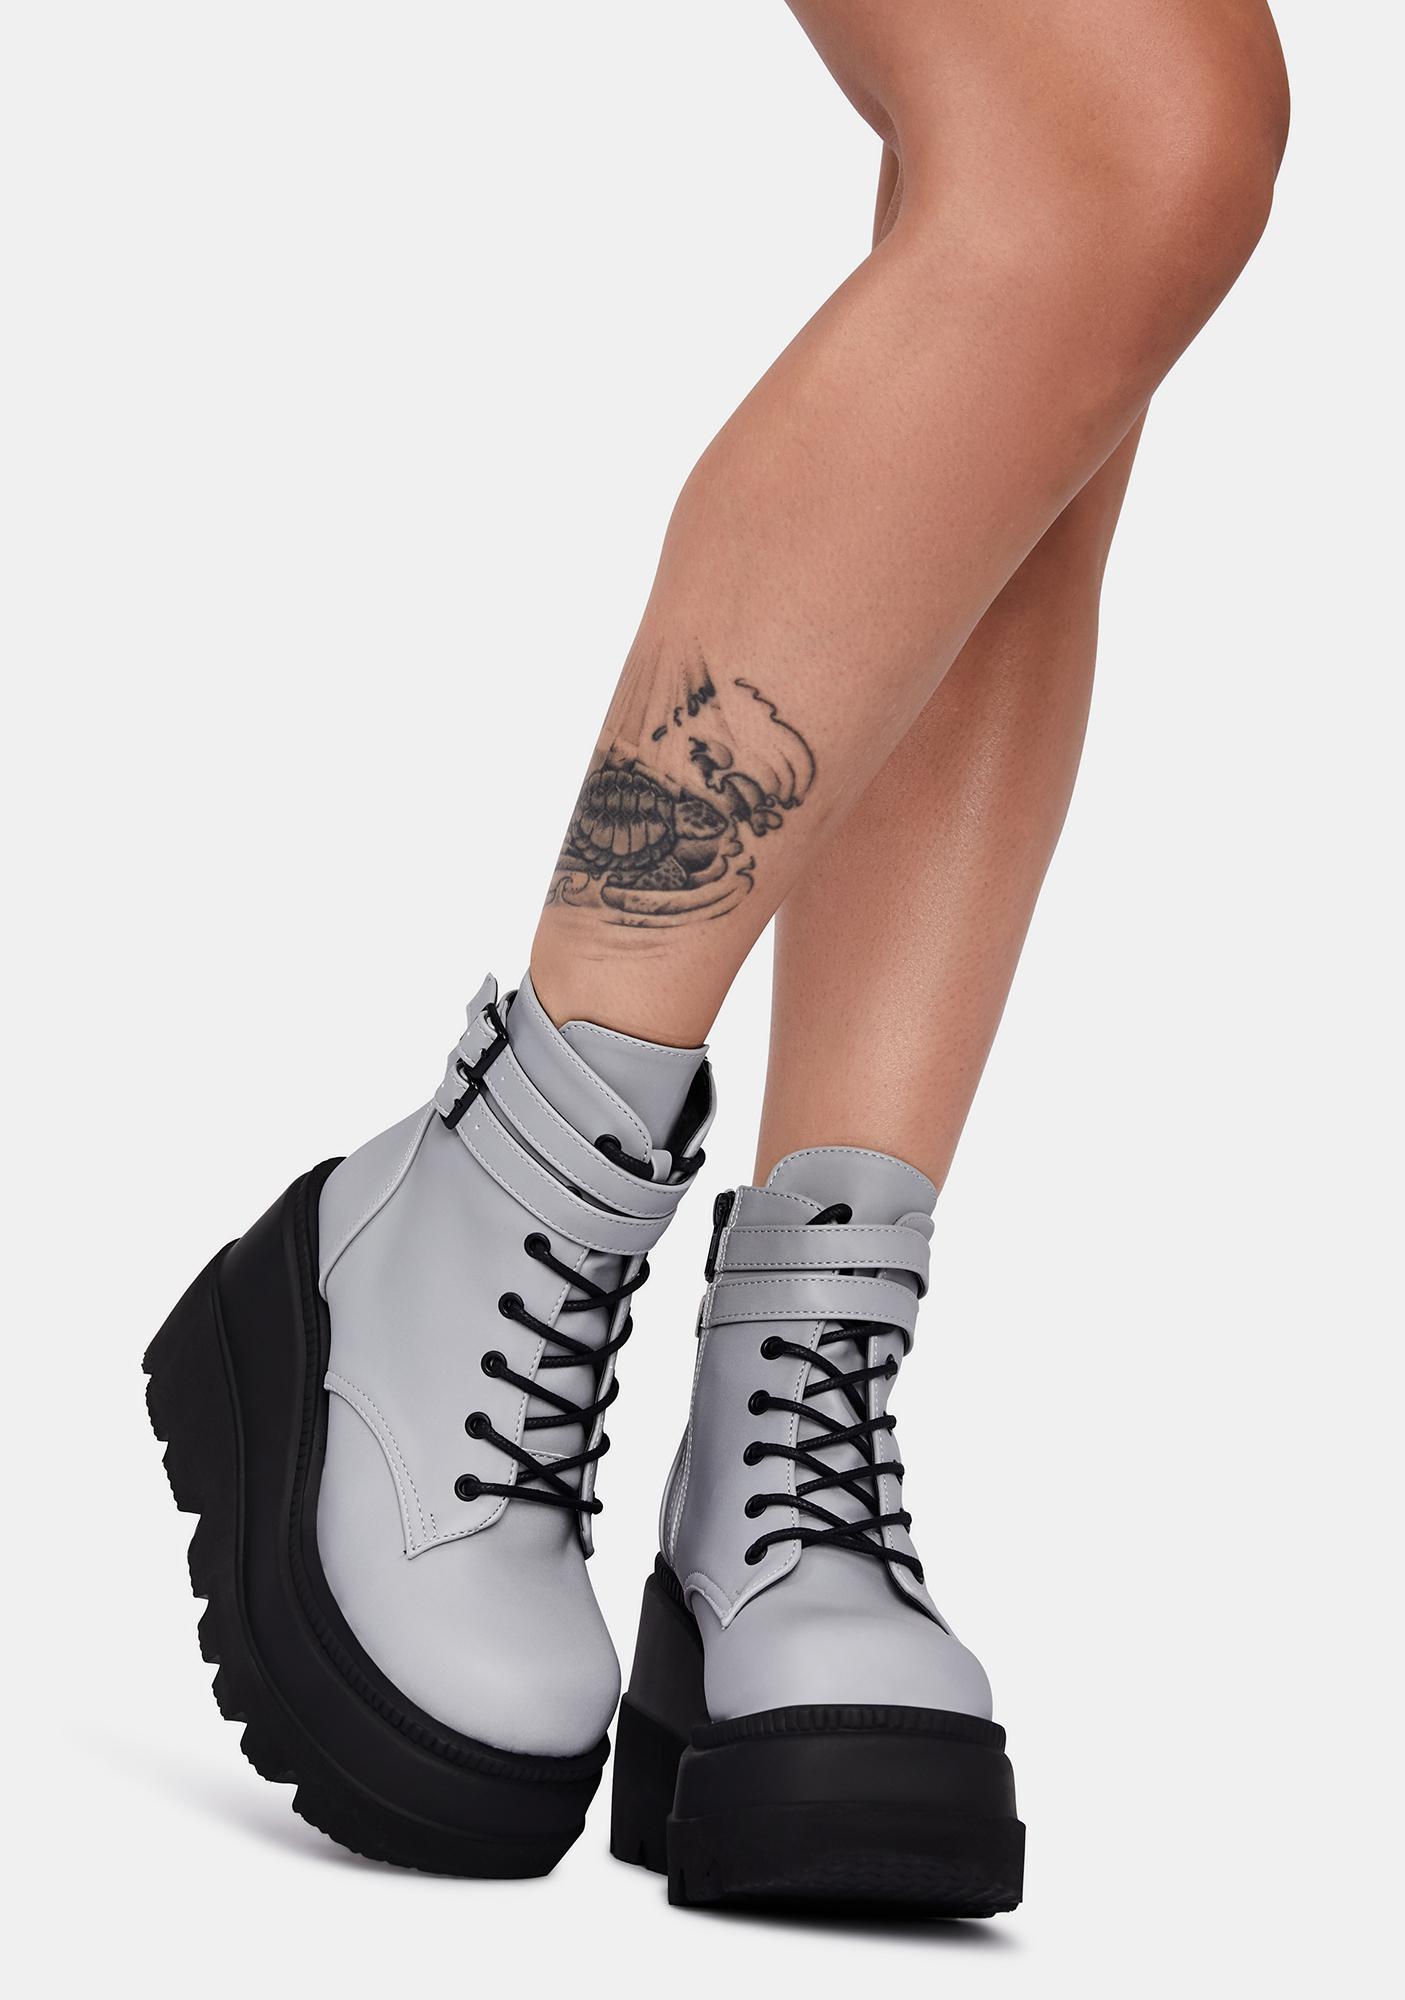 Demonia Reflective Technopagan Platform Boots